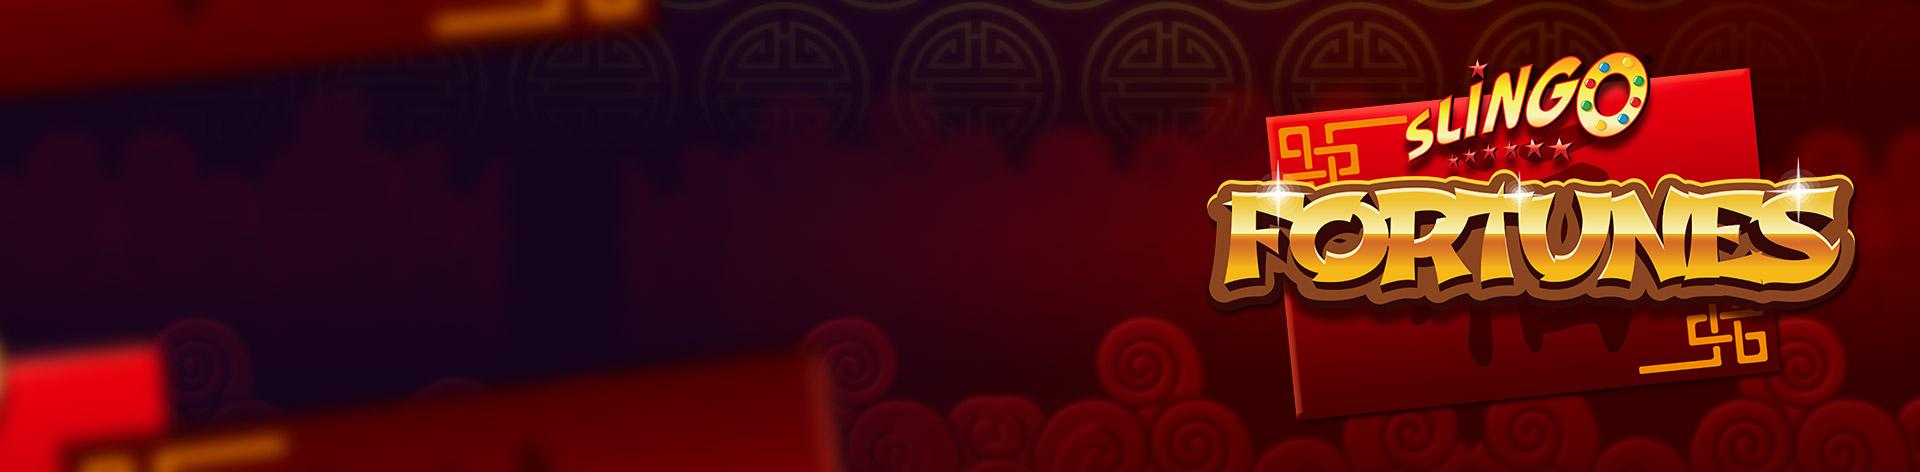 Slingo Fortunes Slot Logo Umbingo